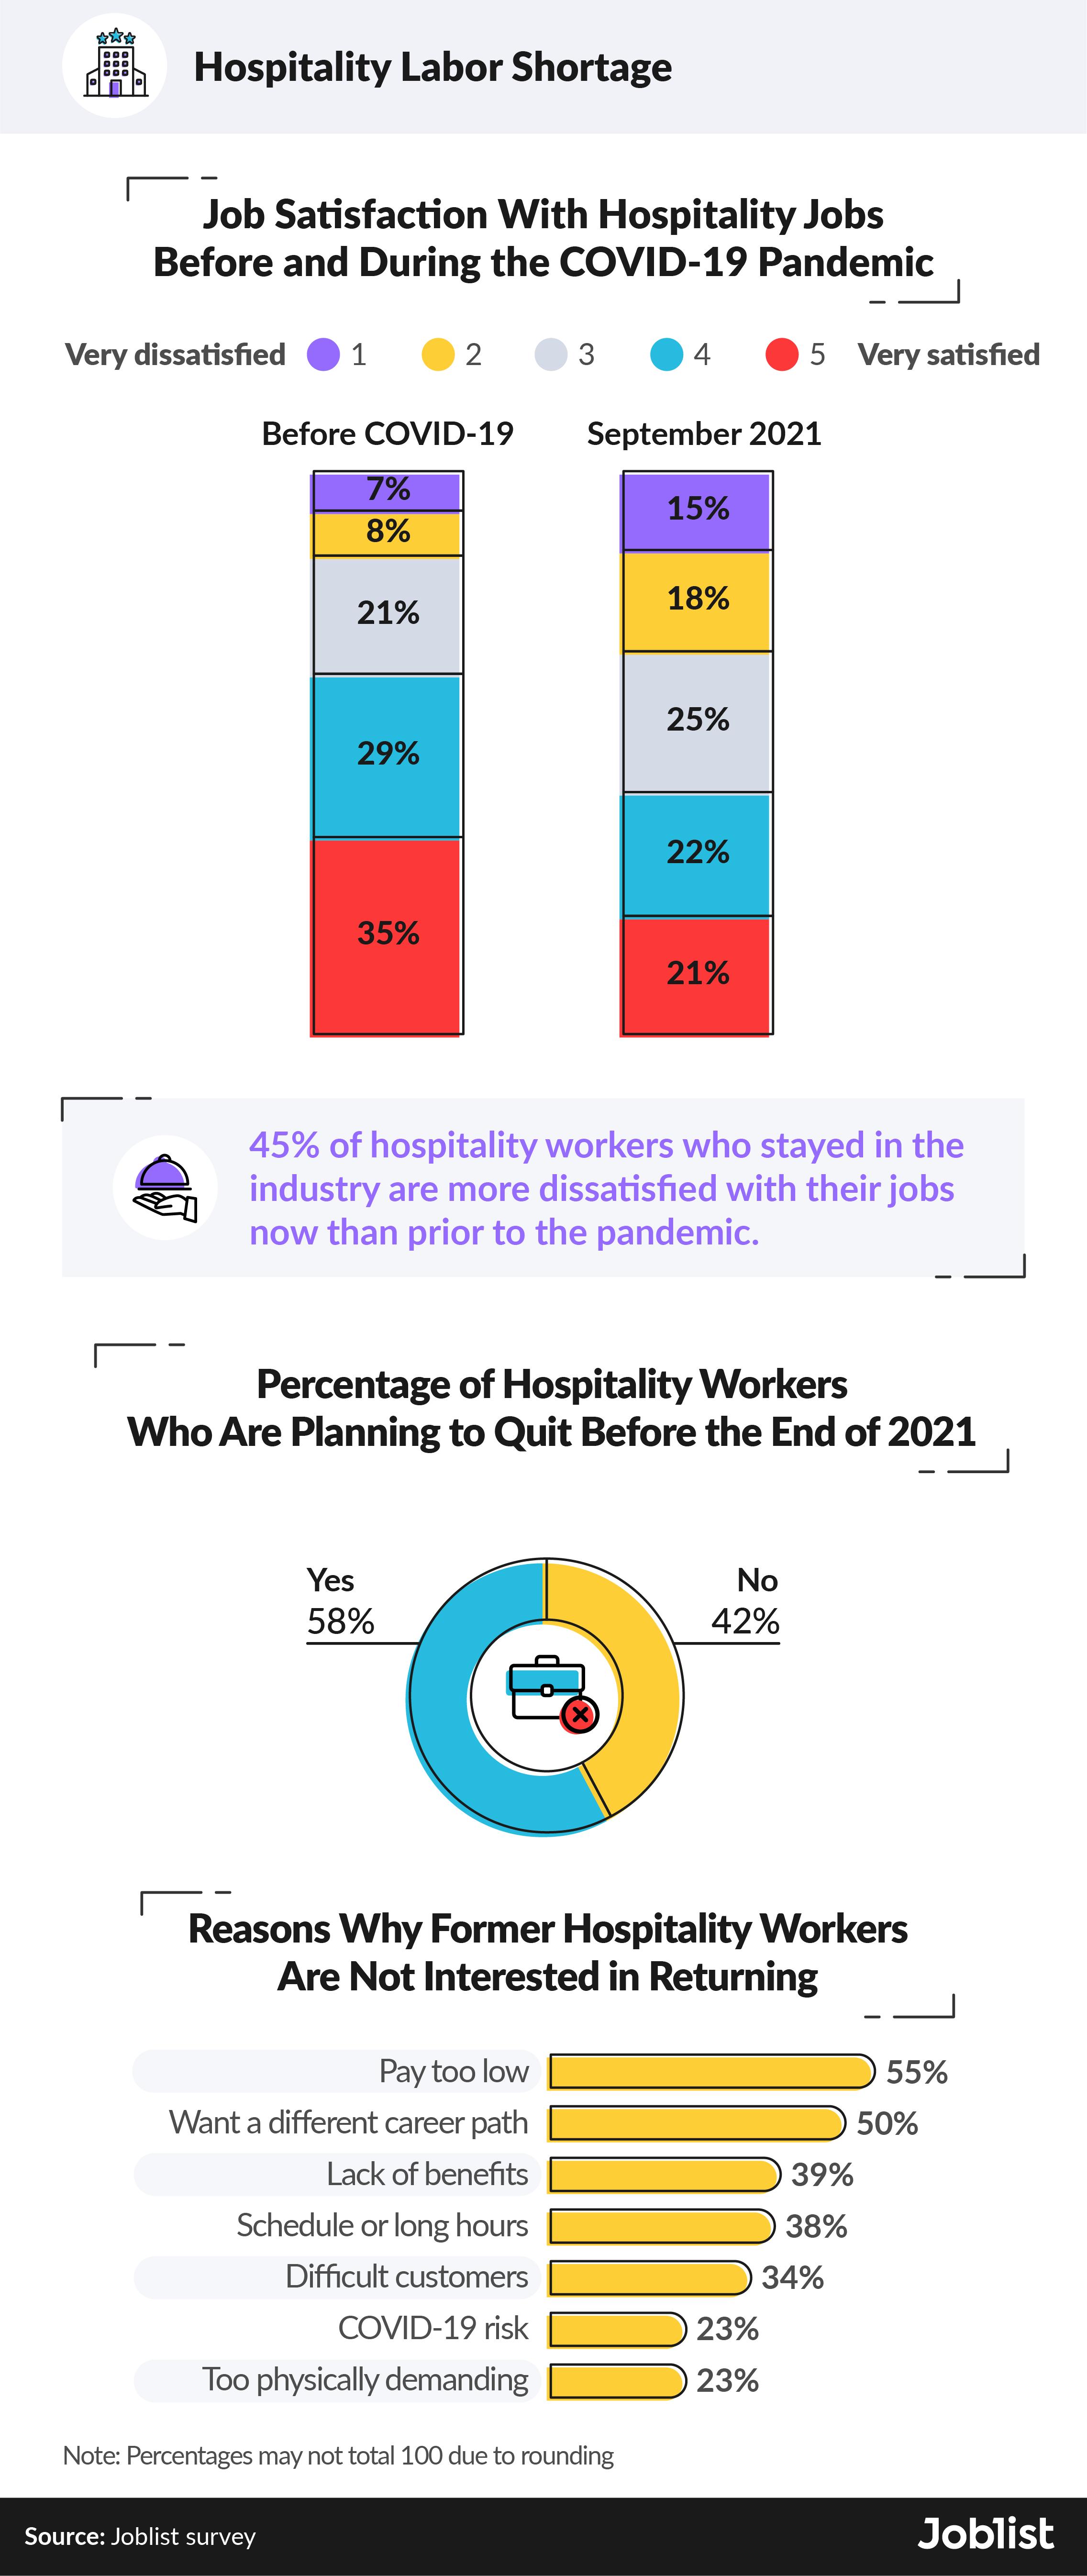 hospitality-labor-shortage-during-pandemic